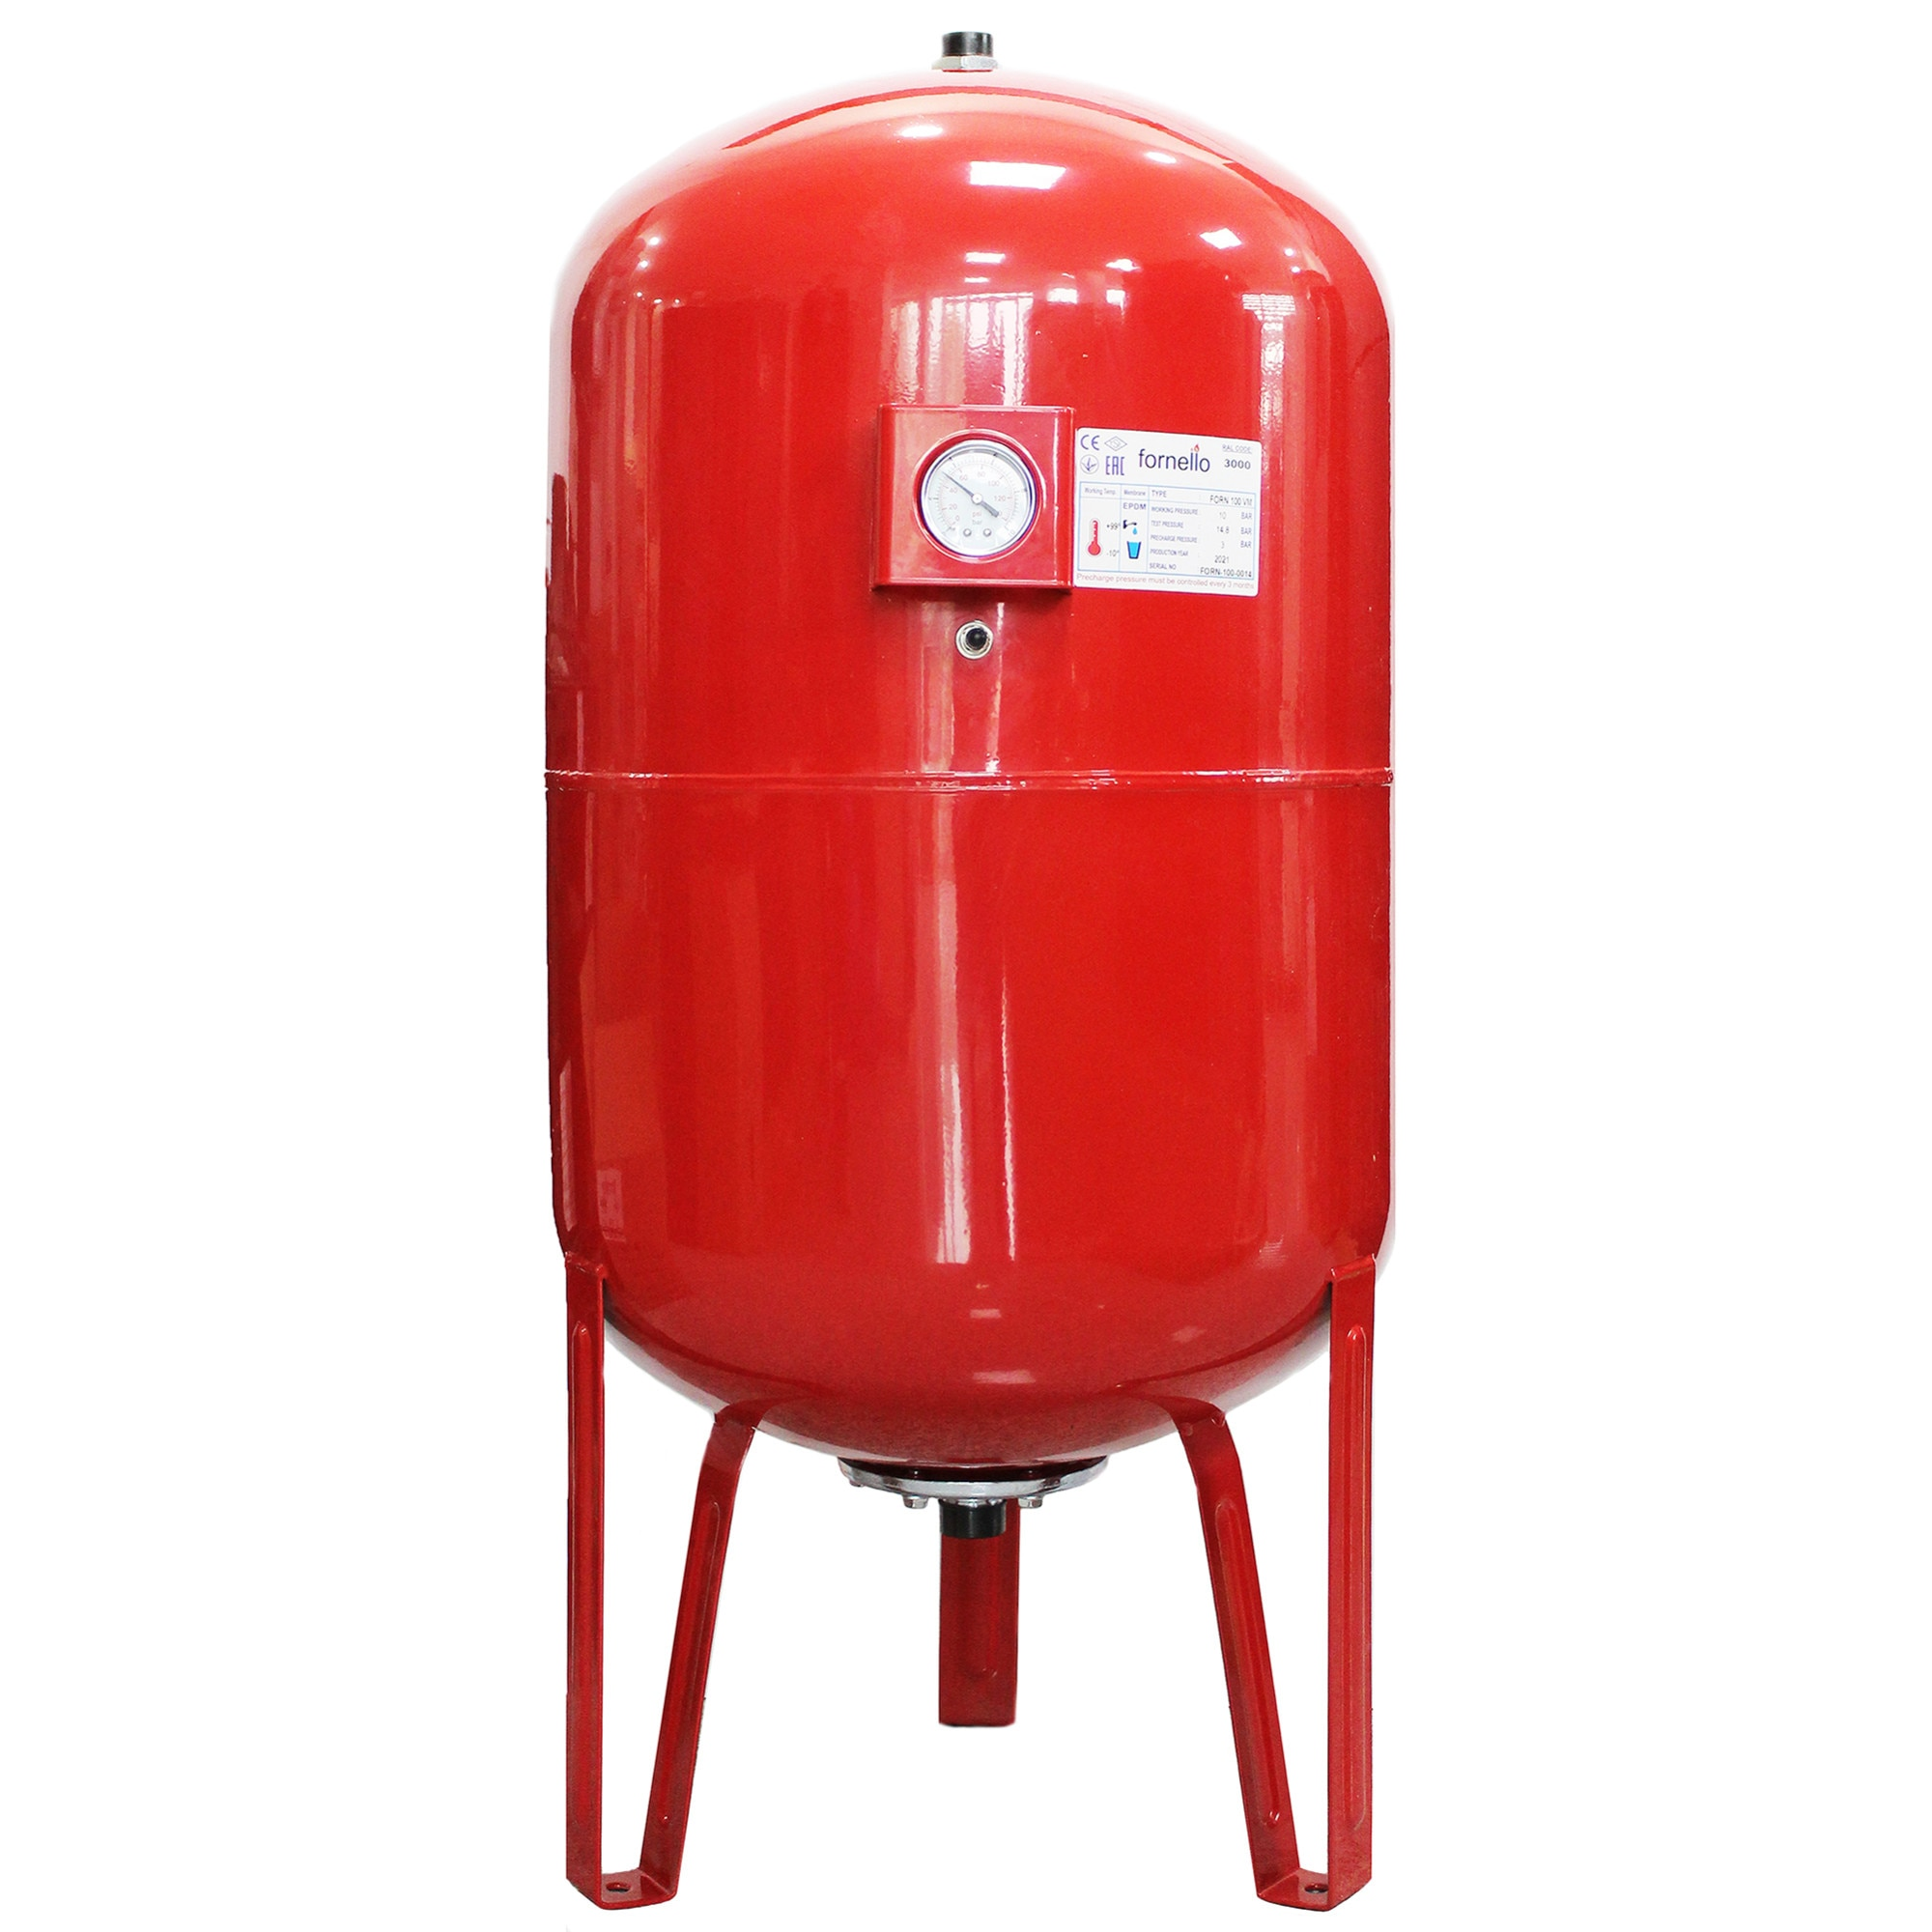 Fotografie Vas expansiune termic Fornello, 100 litri, vertical, cu picioare si manometru, culoare rosu, presiune maxima 10 bar, membrana EPDM